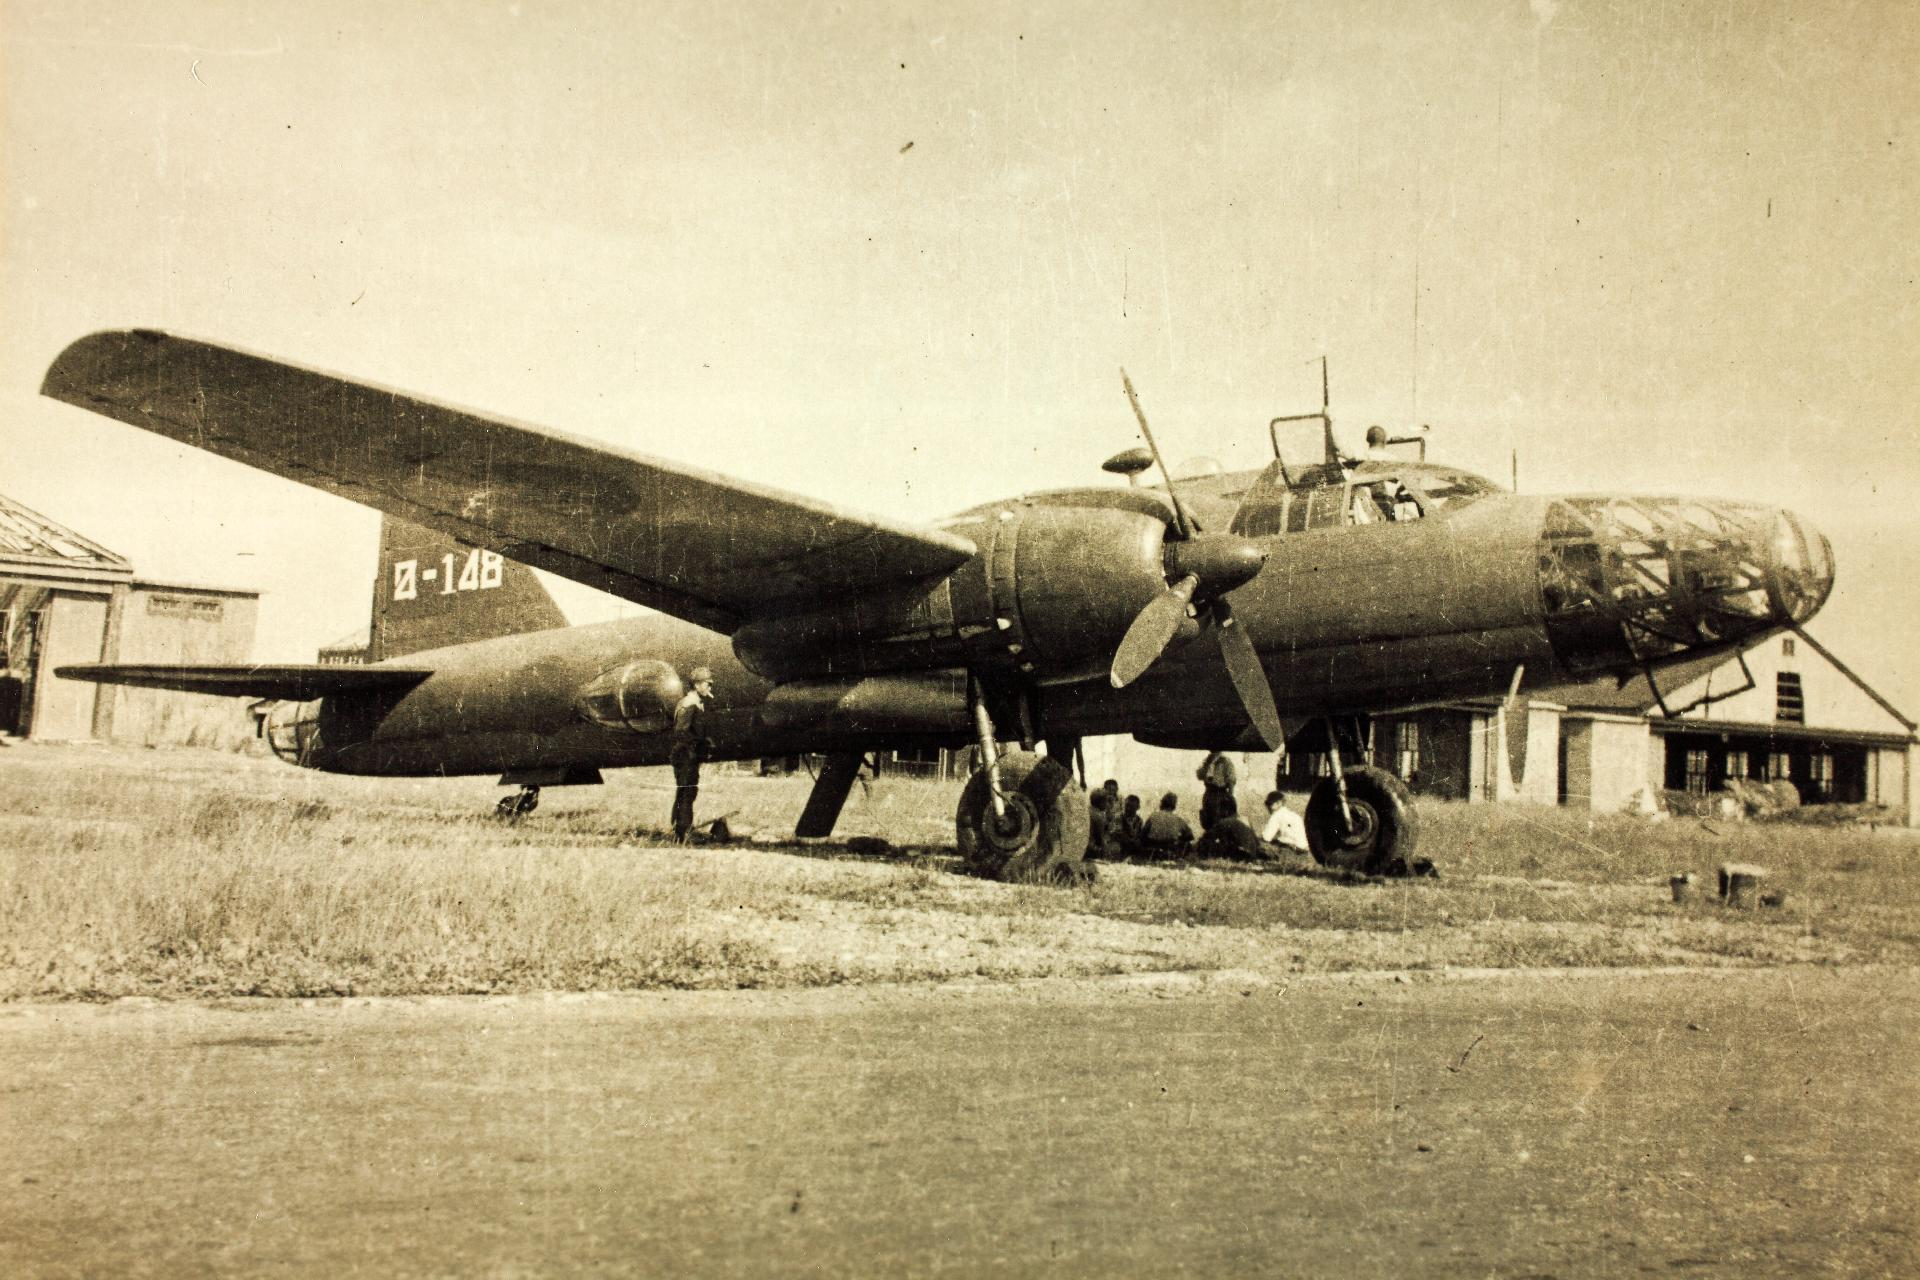 Мицубиси Ki-67 «Хирю» - двухмоторный цельнометаллический бомбардировщик